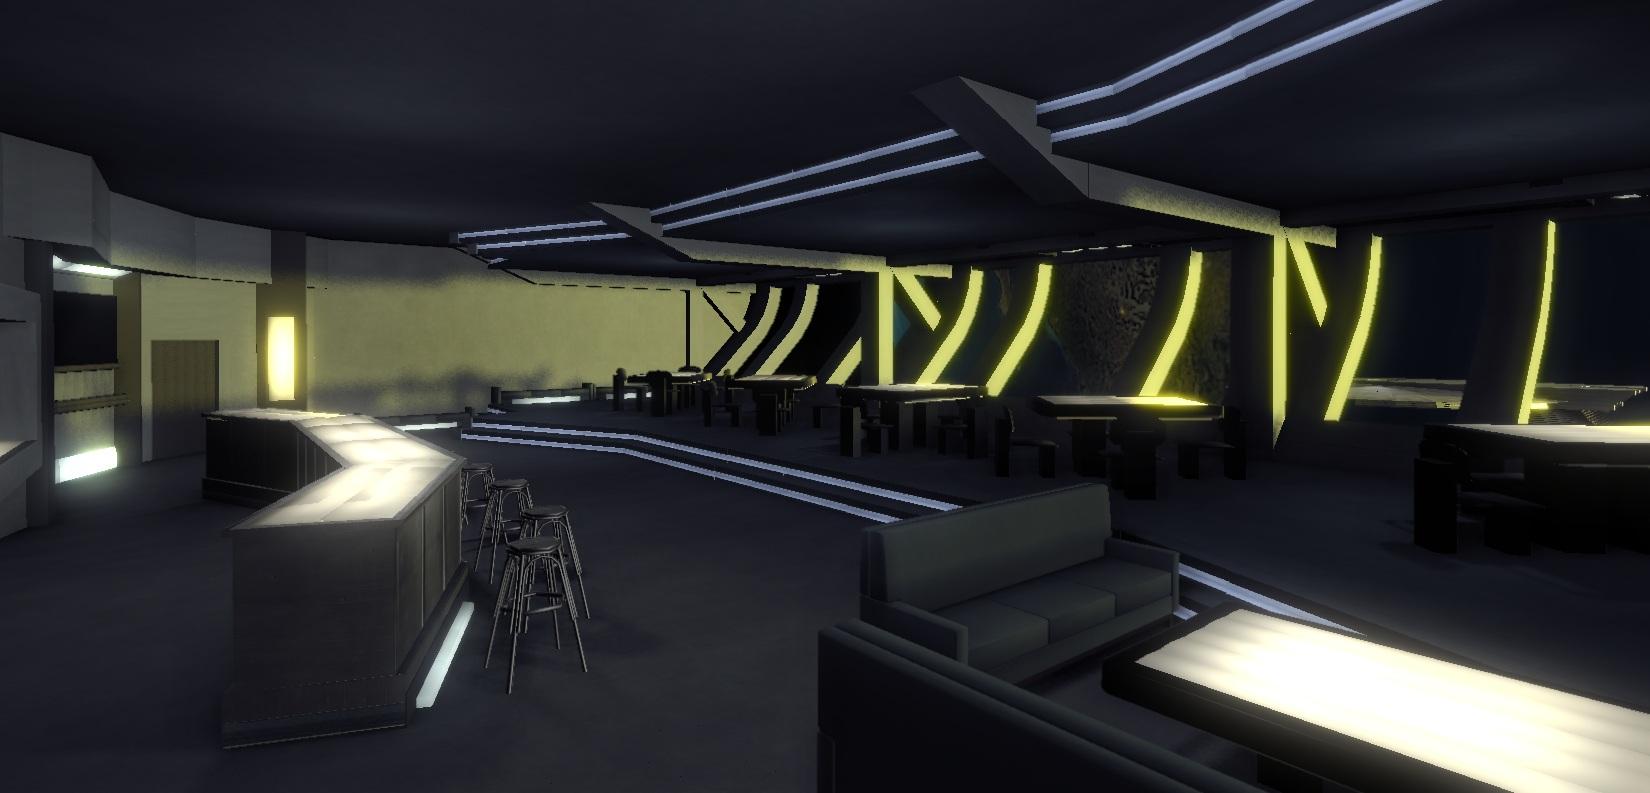 Star Trek 10 Forward Image Feariun Mod Db